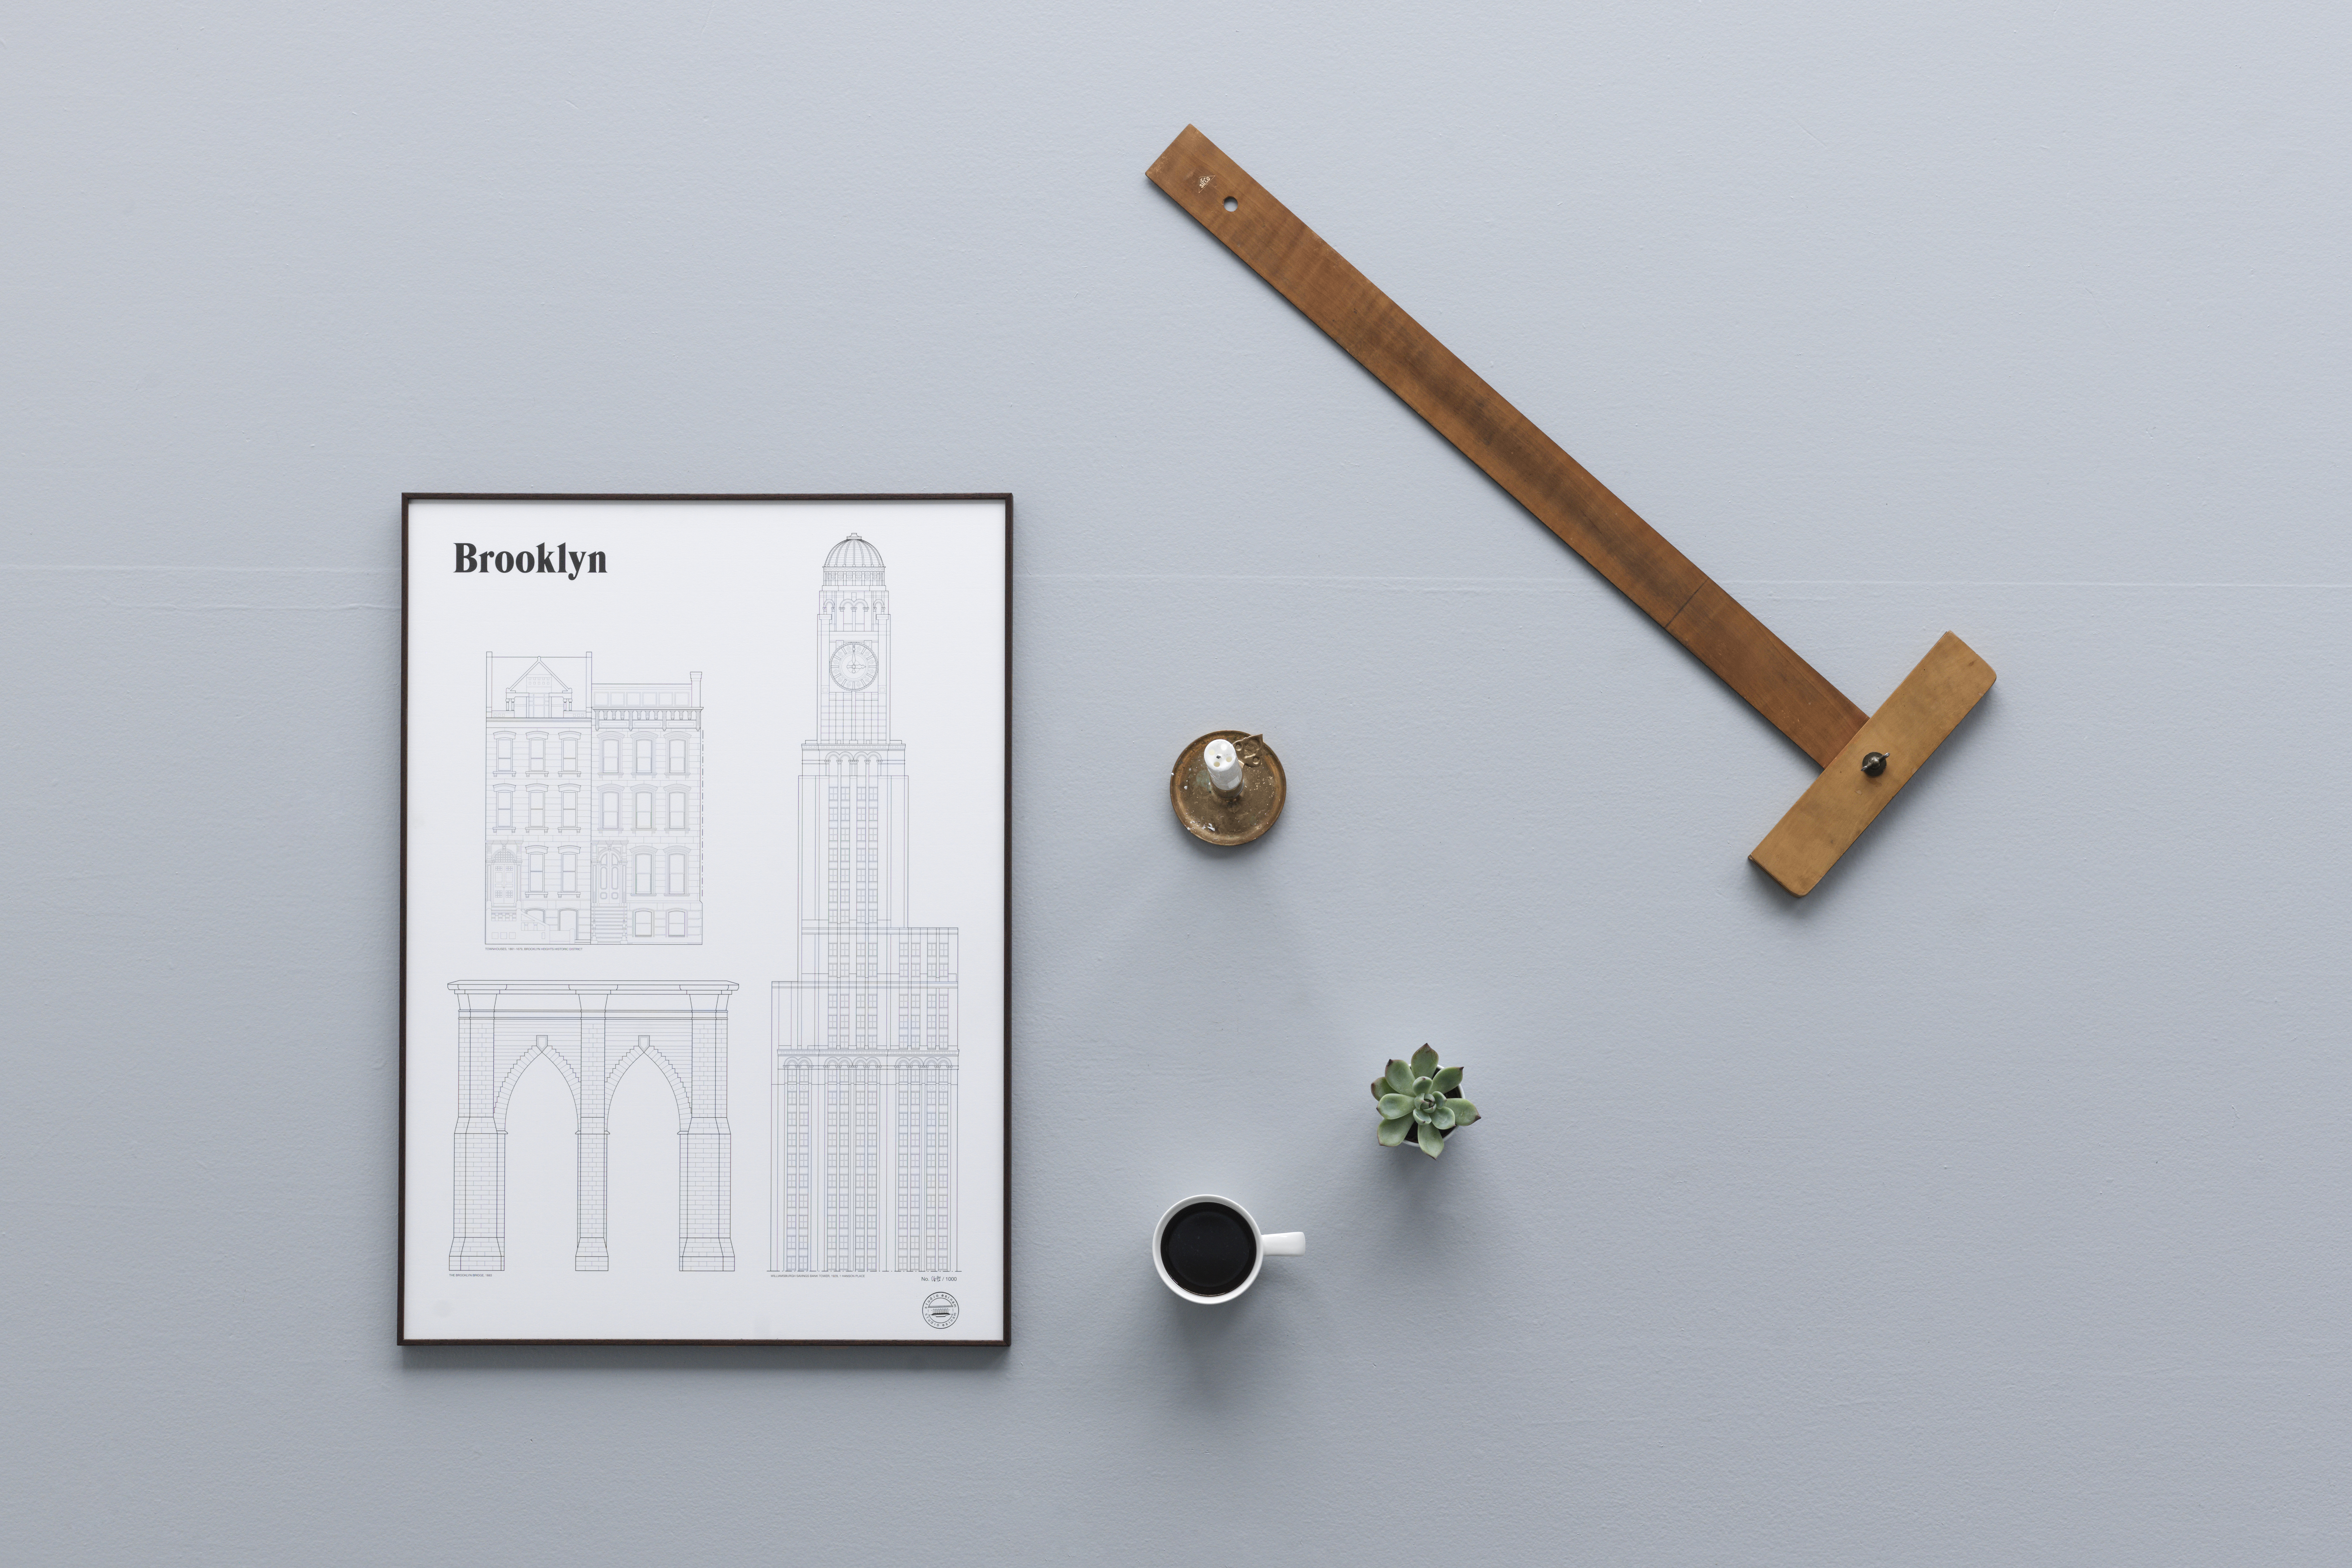 Architectural portrait of three Brooklyn, New York landmark buildings